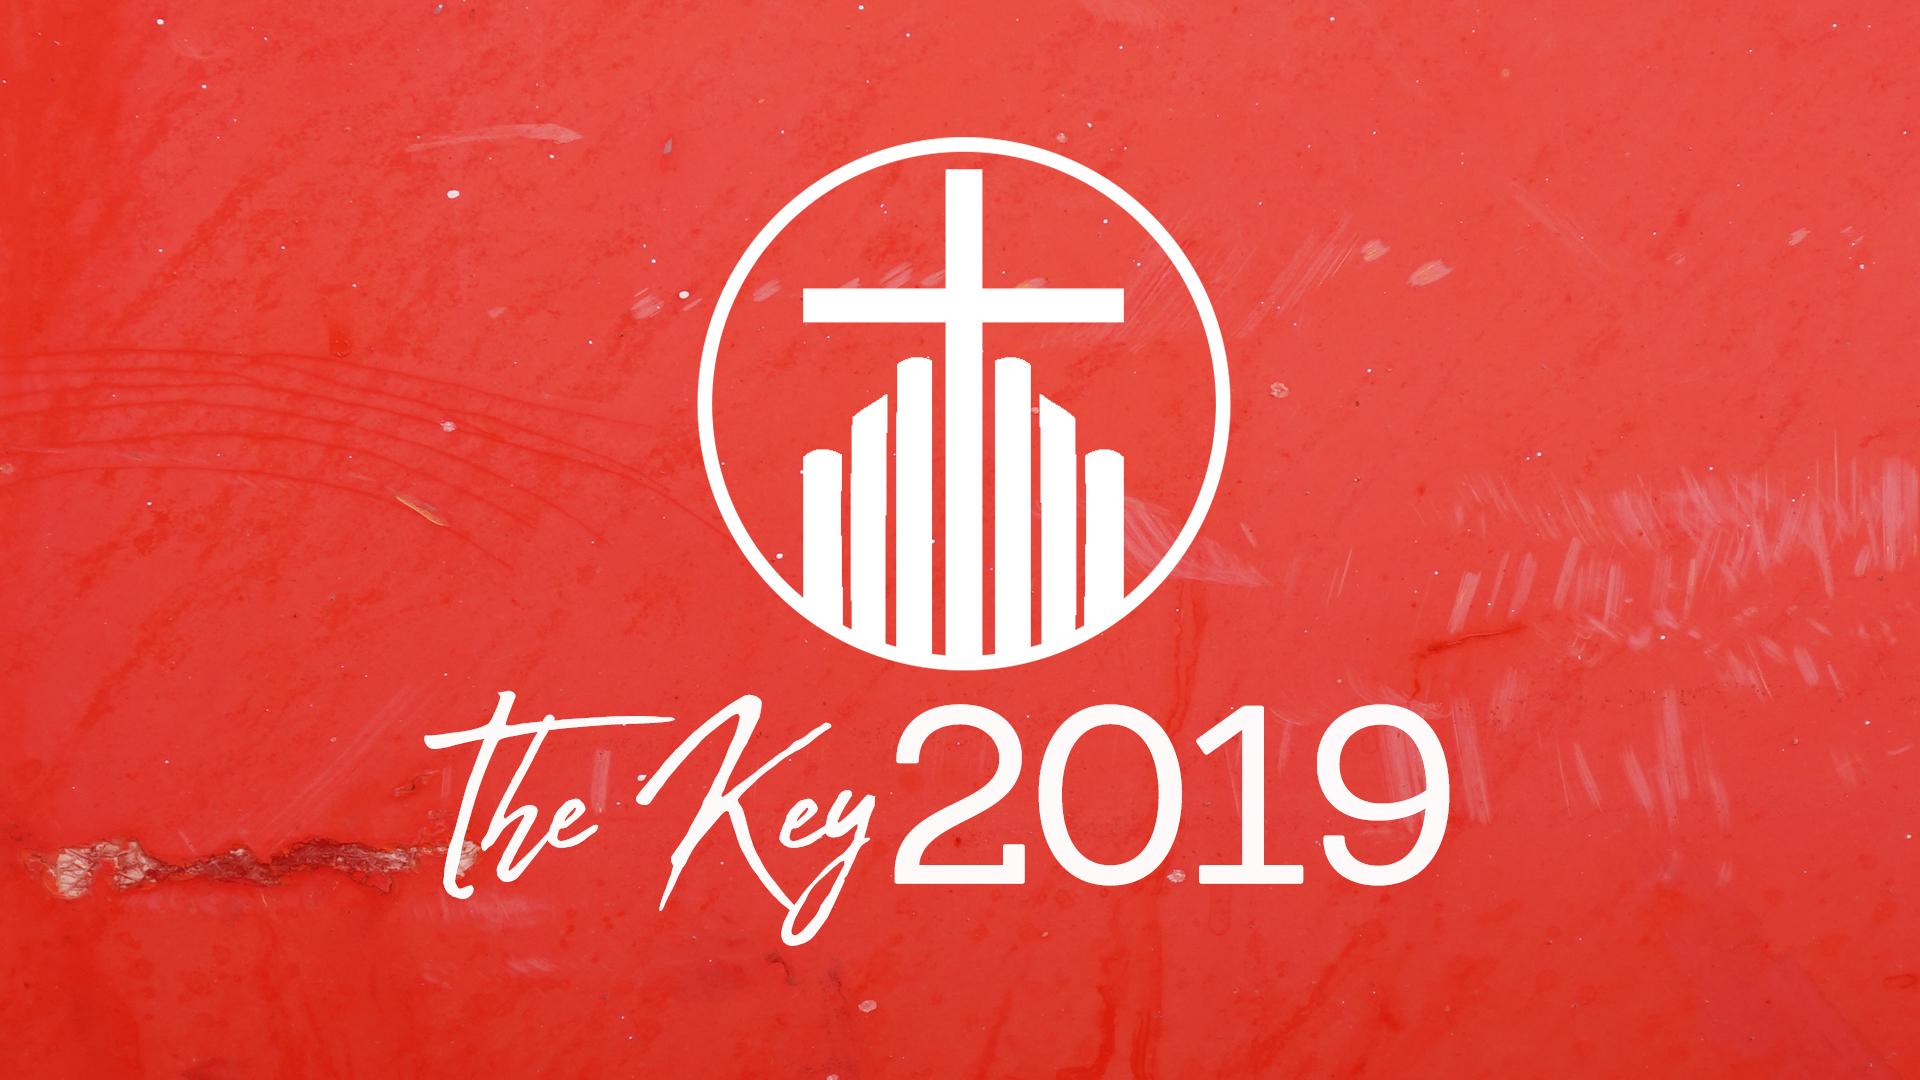 The Key 2019.jpg